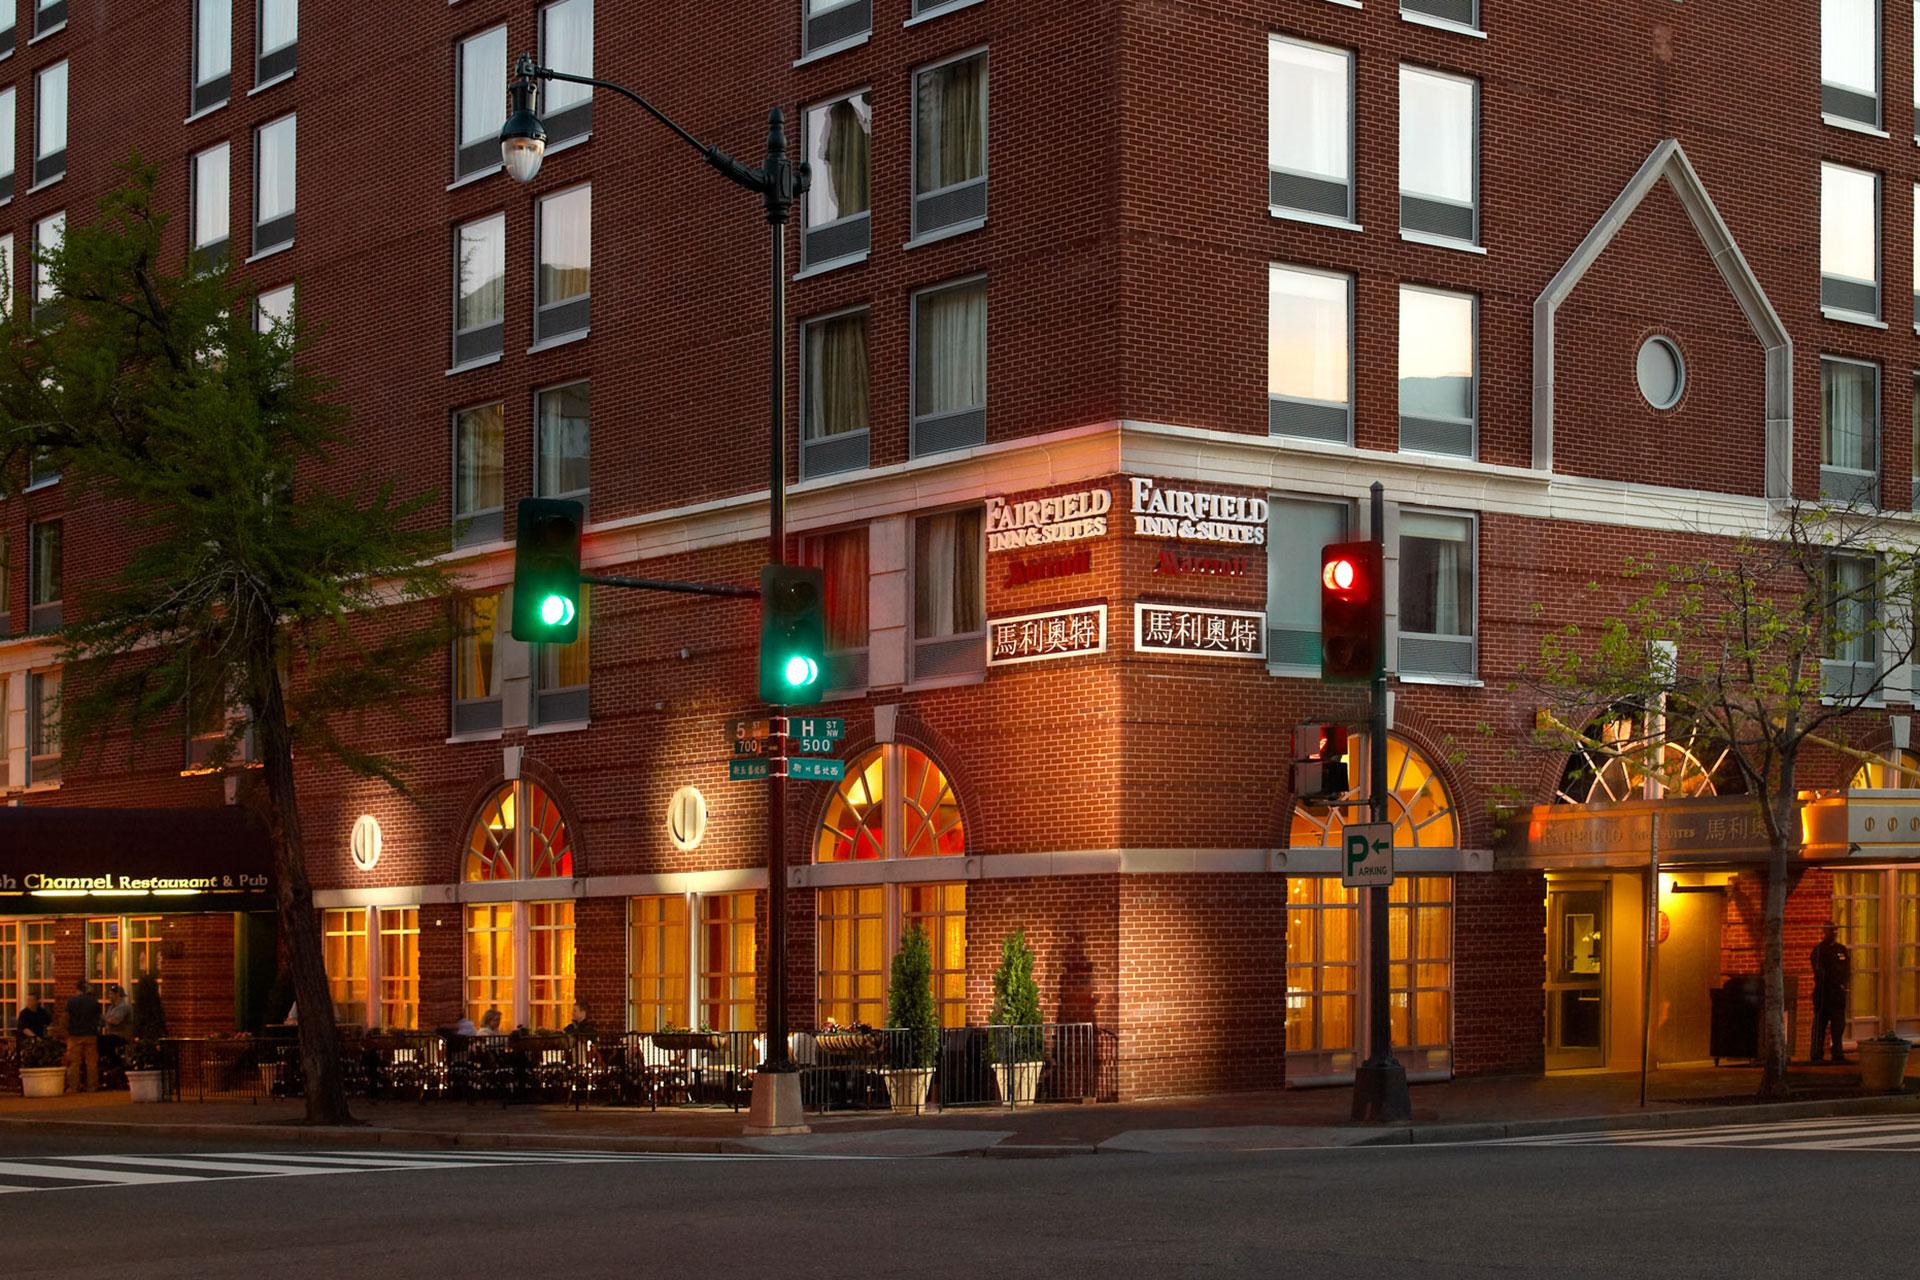 Fairfield Inn & Suites Washington D.C./Downtown